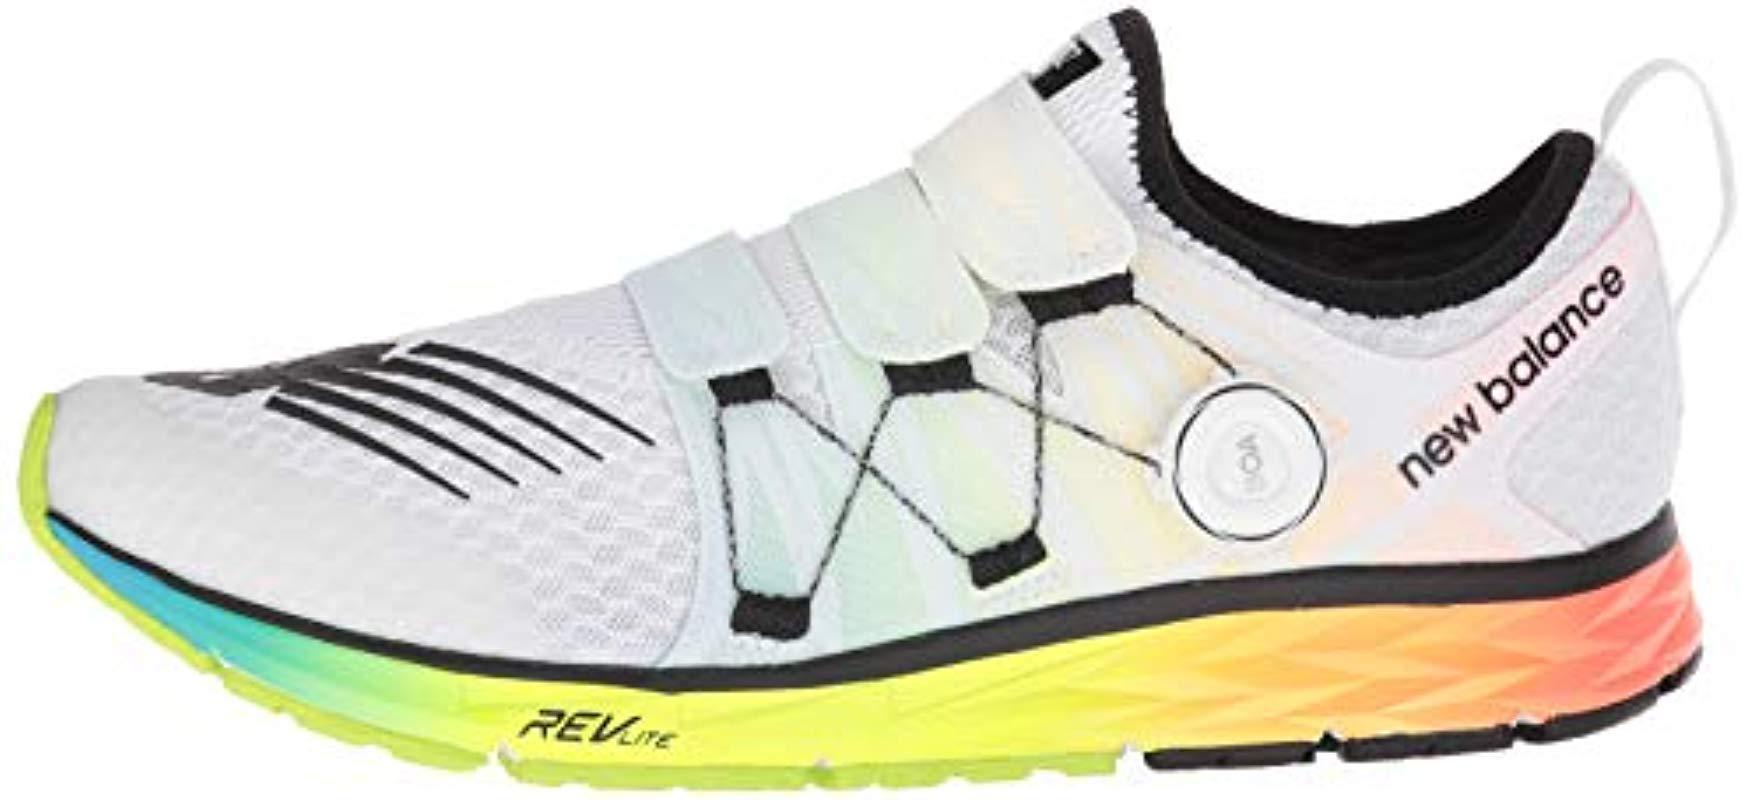 New Balance 1500v4 Boa Running Shoes in White for Men - Save 30 ...